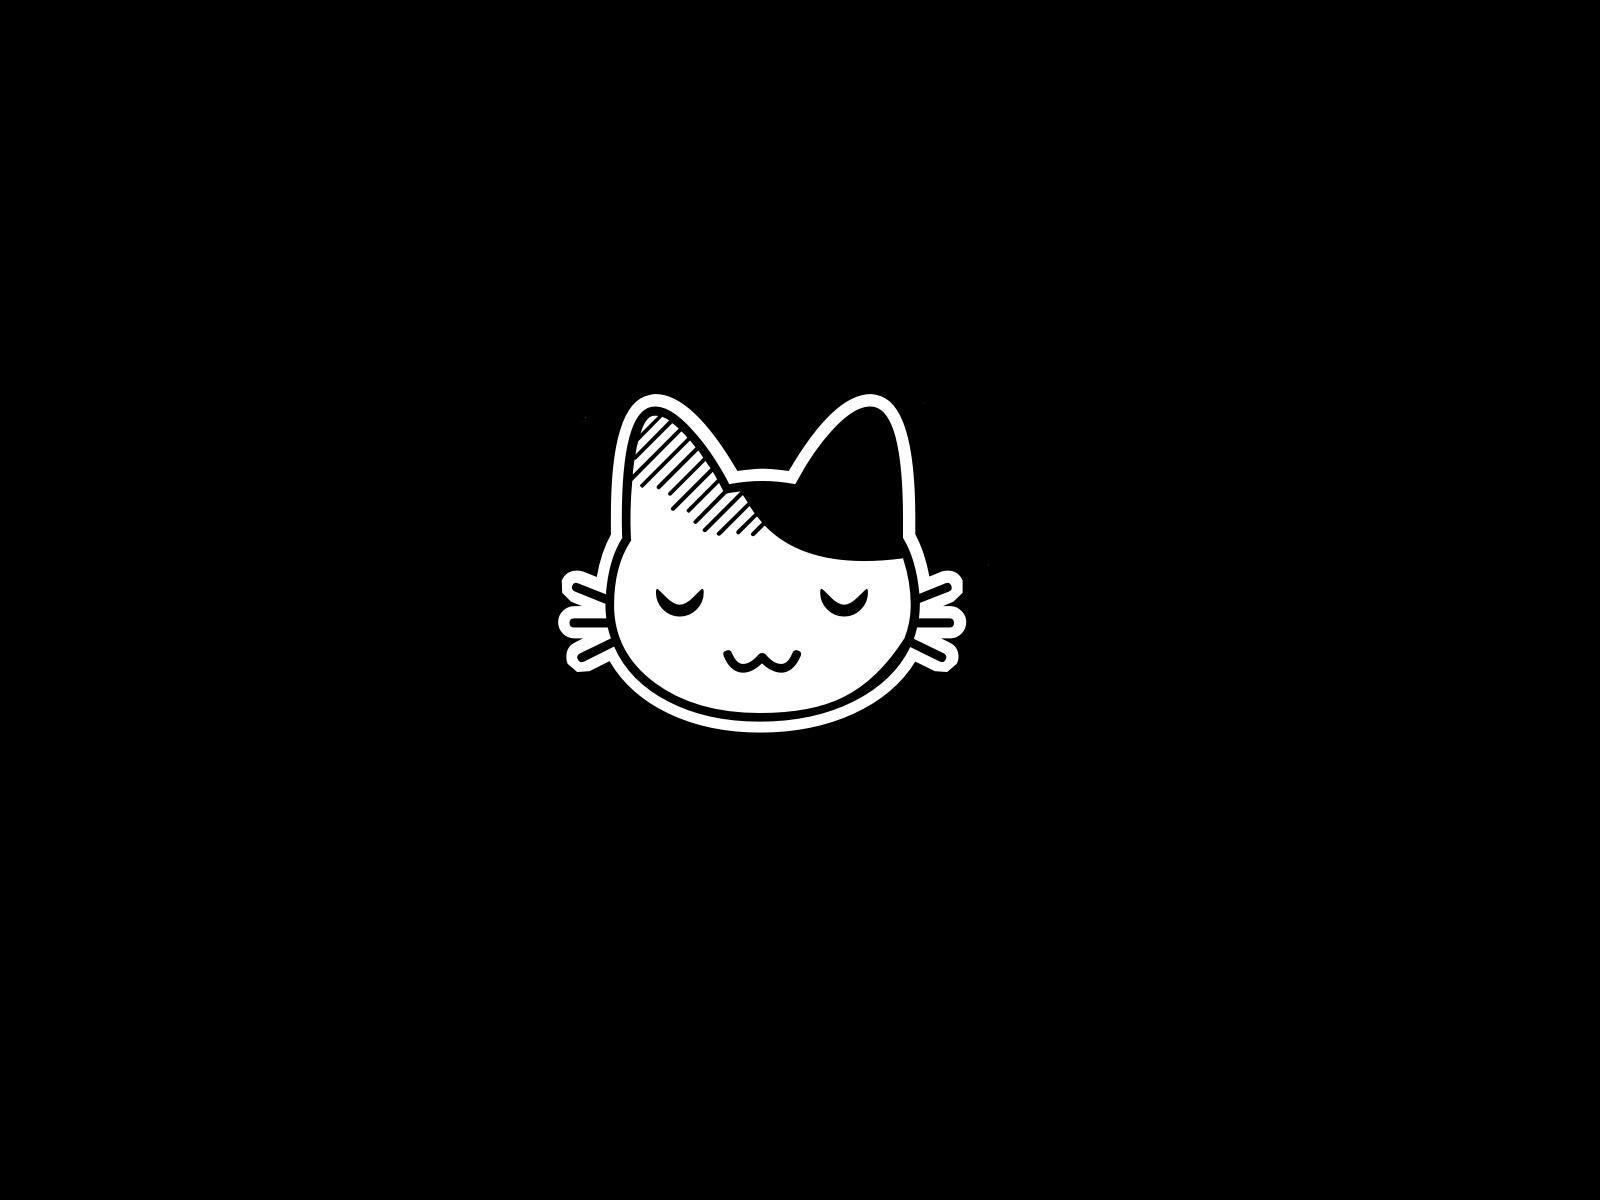 Cute Black Cat Anime Wallpapers Top Free Cute Black Cat Anime Backgrounds Wallpaperaccess